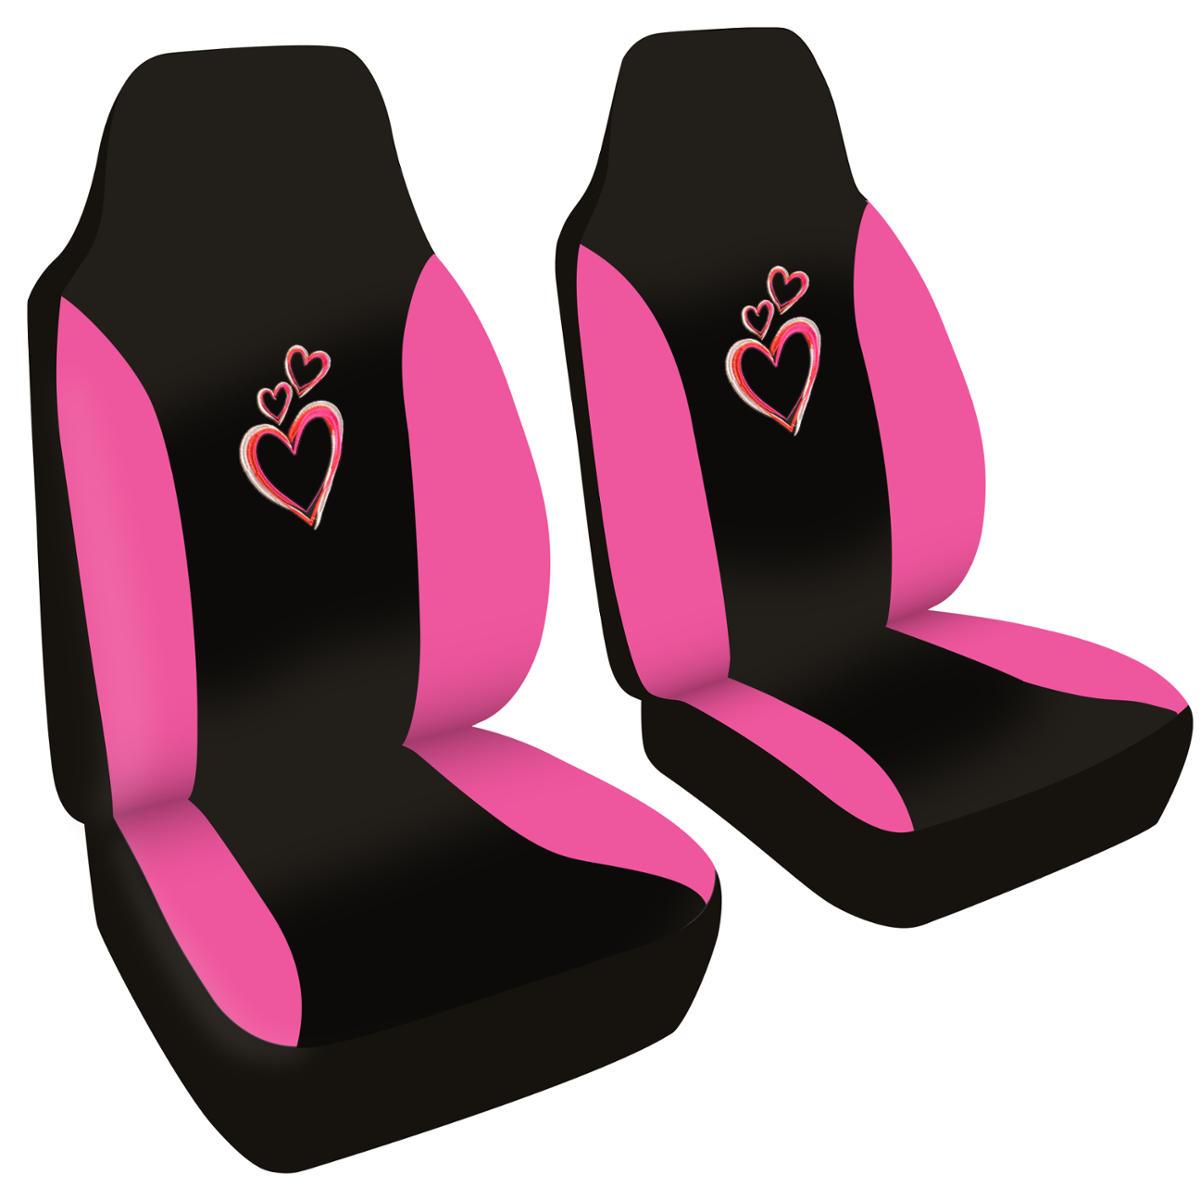 highback bucket car seat covers new love pink white red black ebay. Black Bedroom Furniture Sets. Home Design Ideas